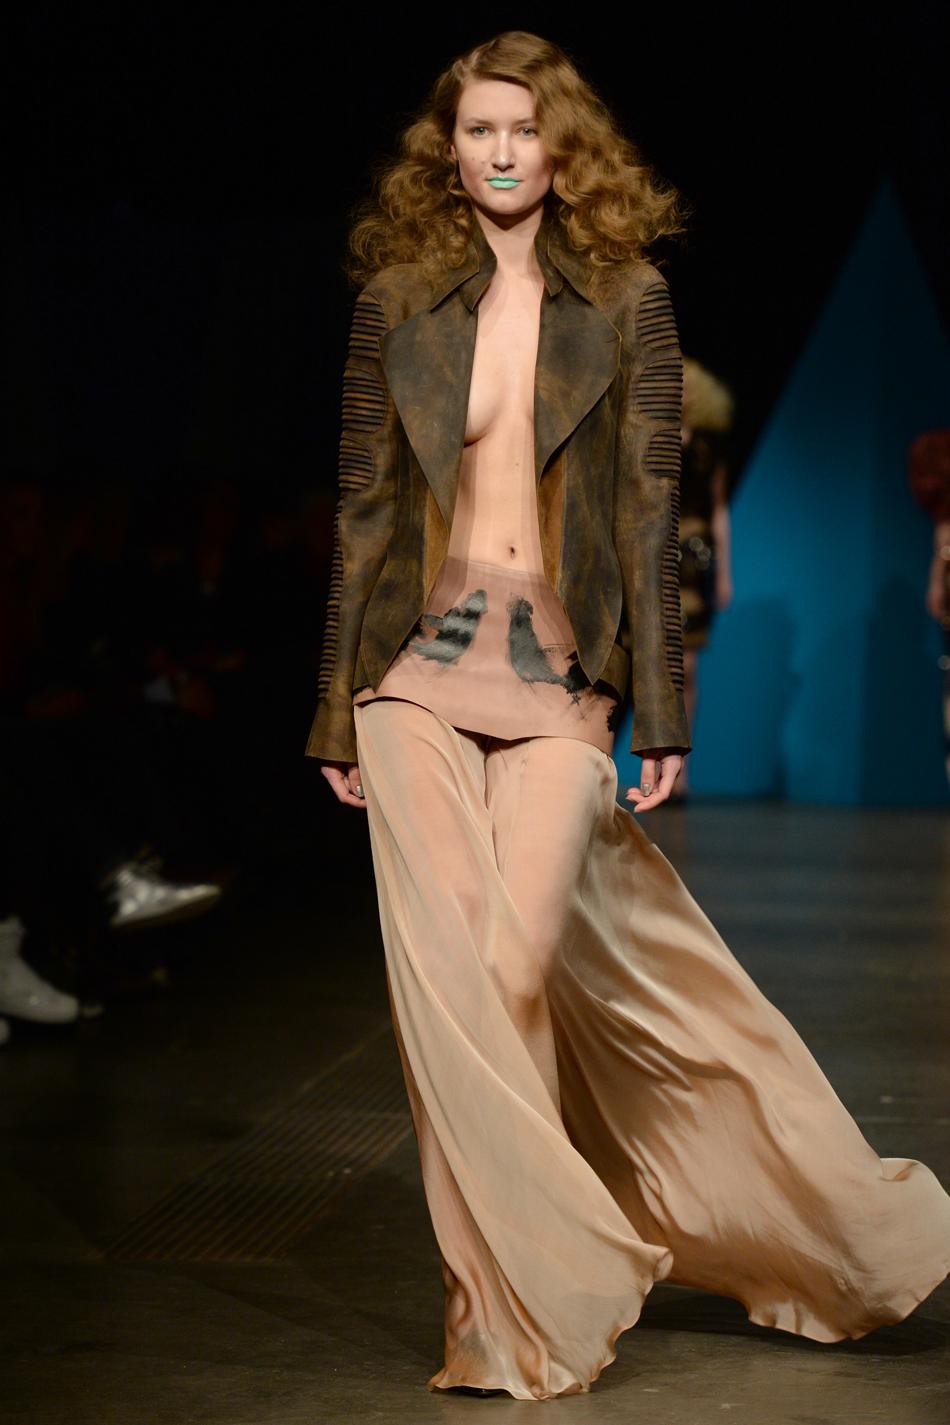 Plnty_Katrine_Terese_Nielsen_DesignersNest2014_1